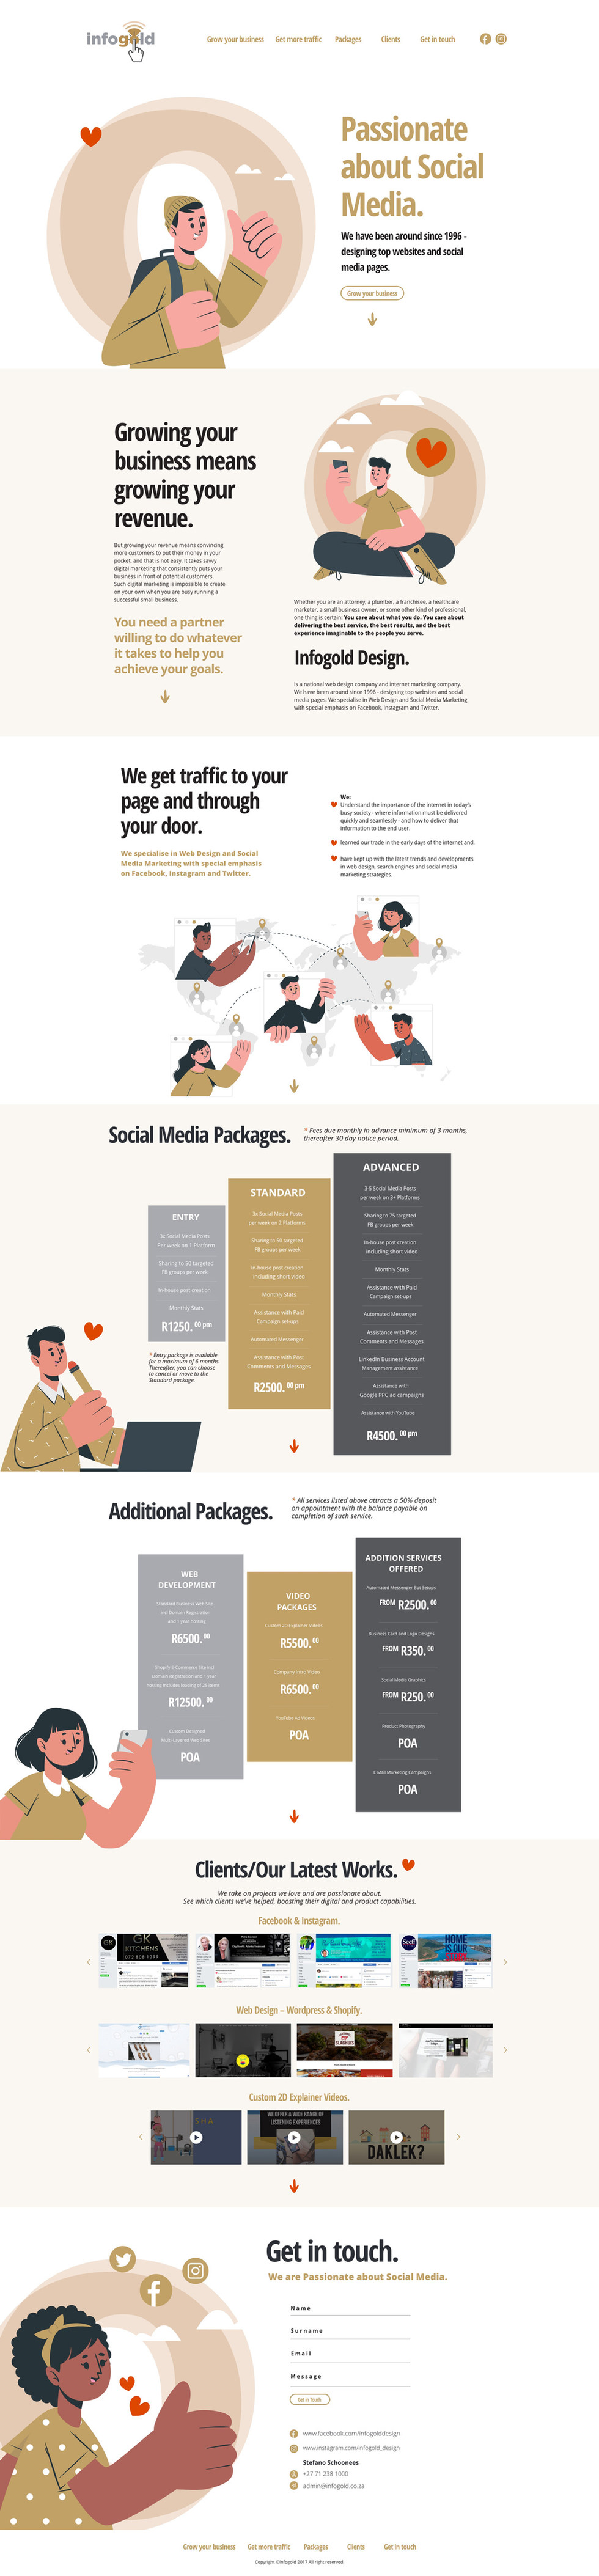 InfoGold-Single-Page-website.jpg